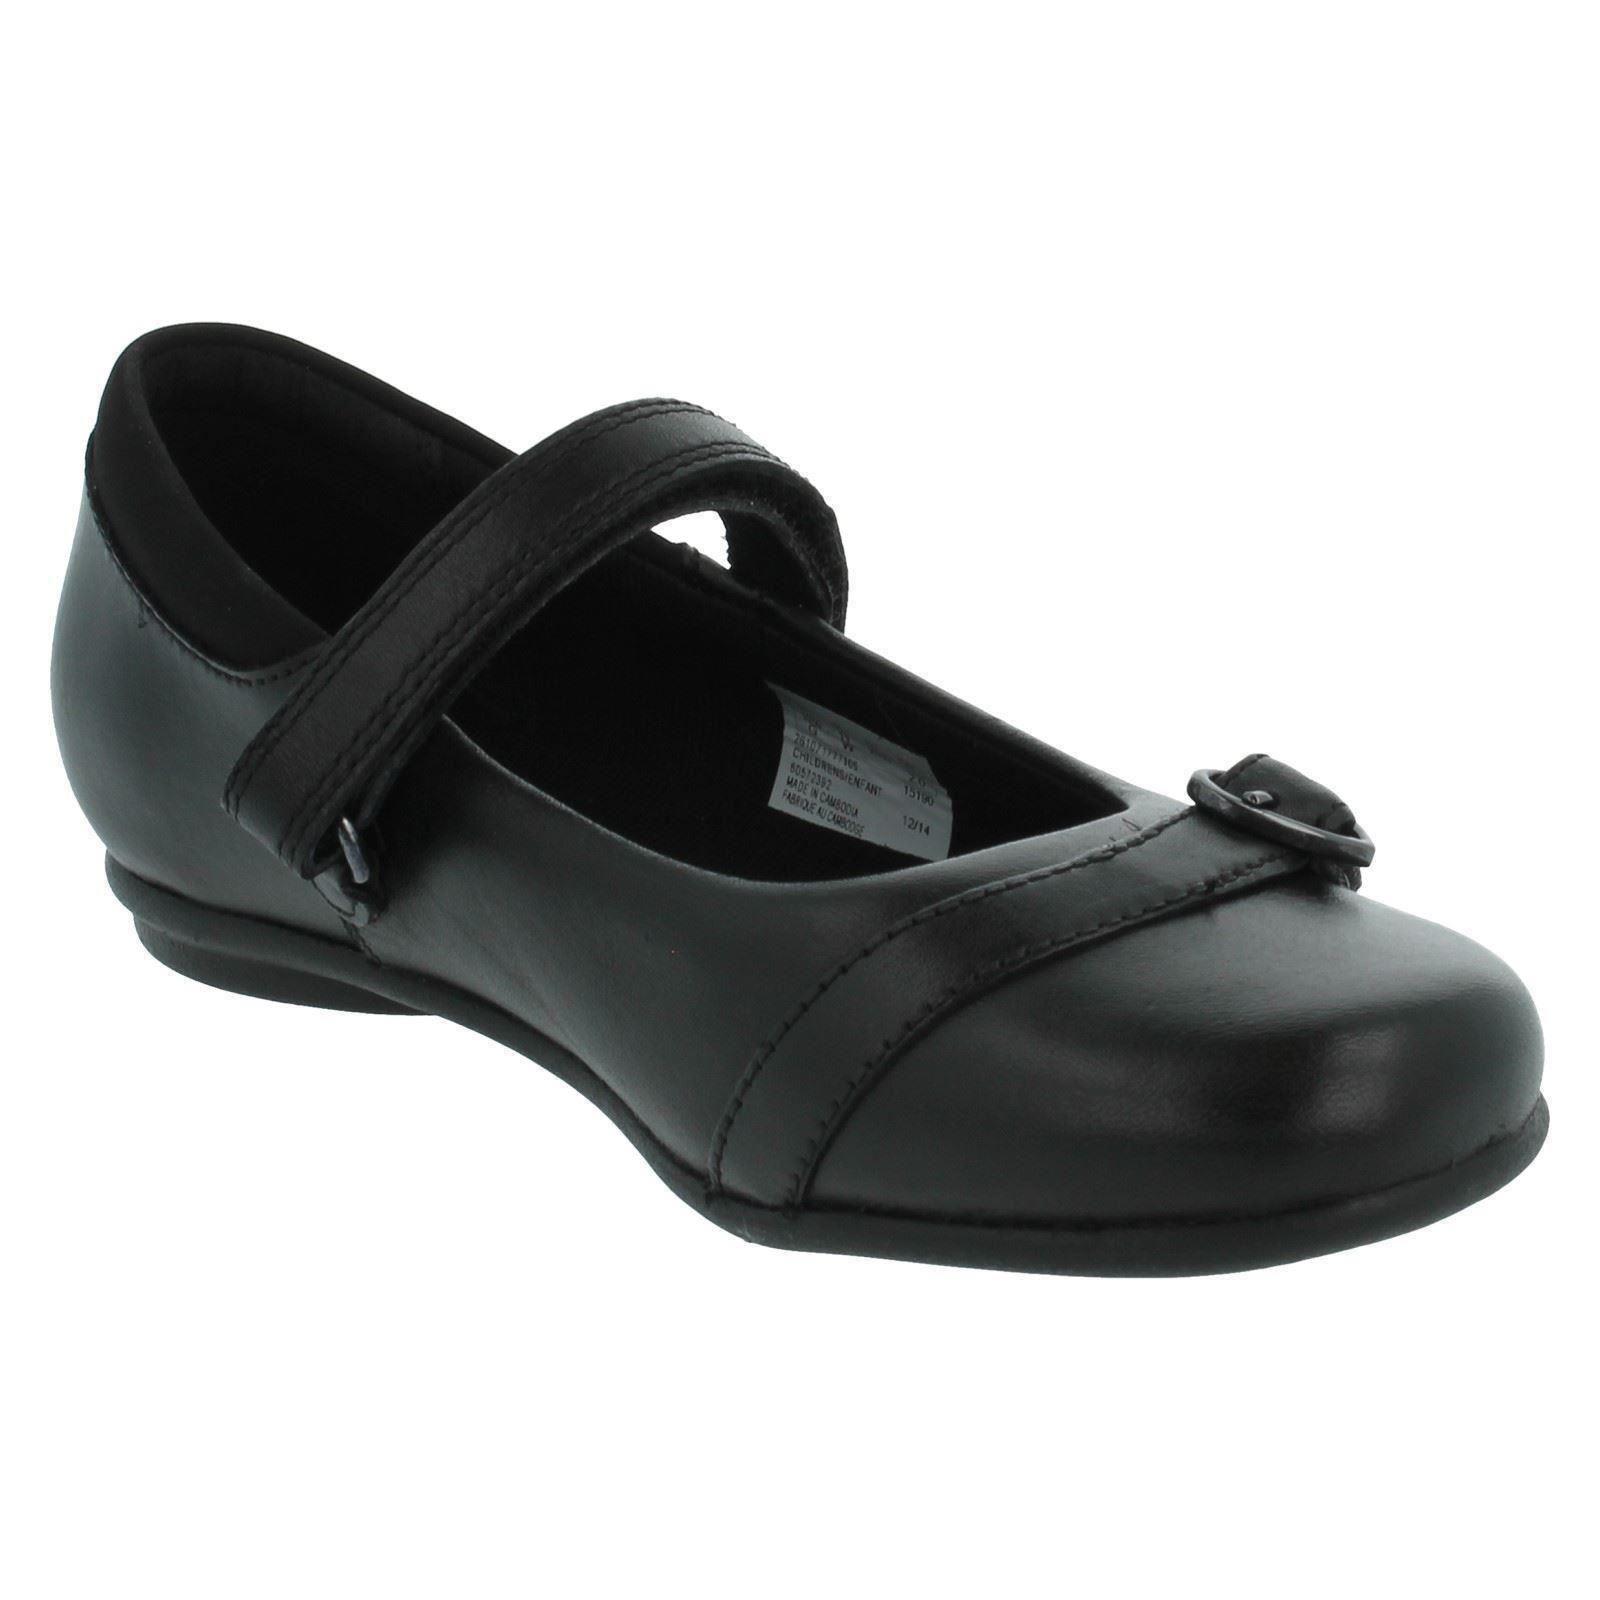 Girls Clarks Shoes Style Tasha Bay